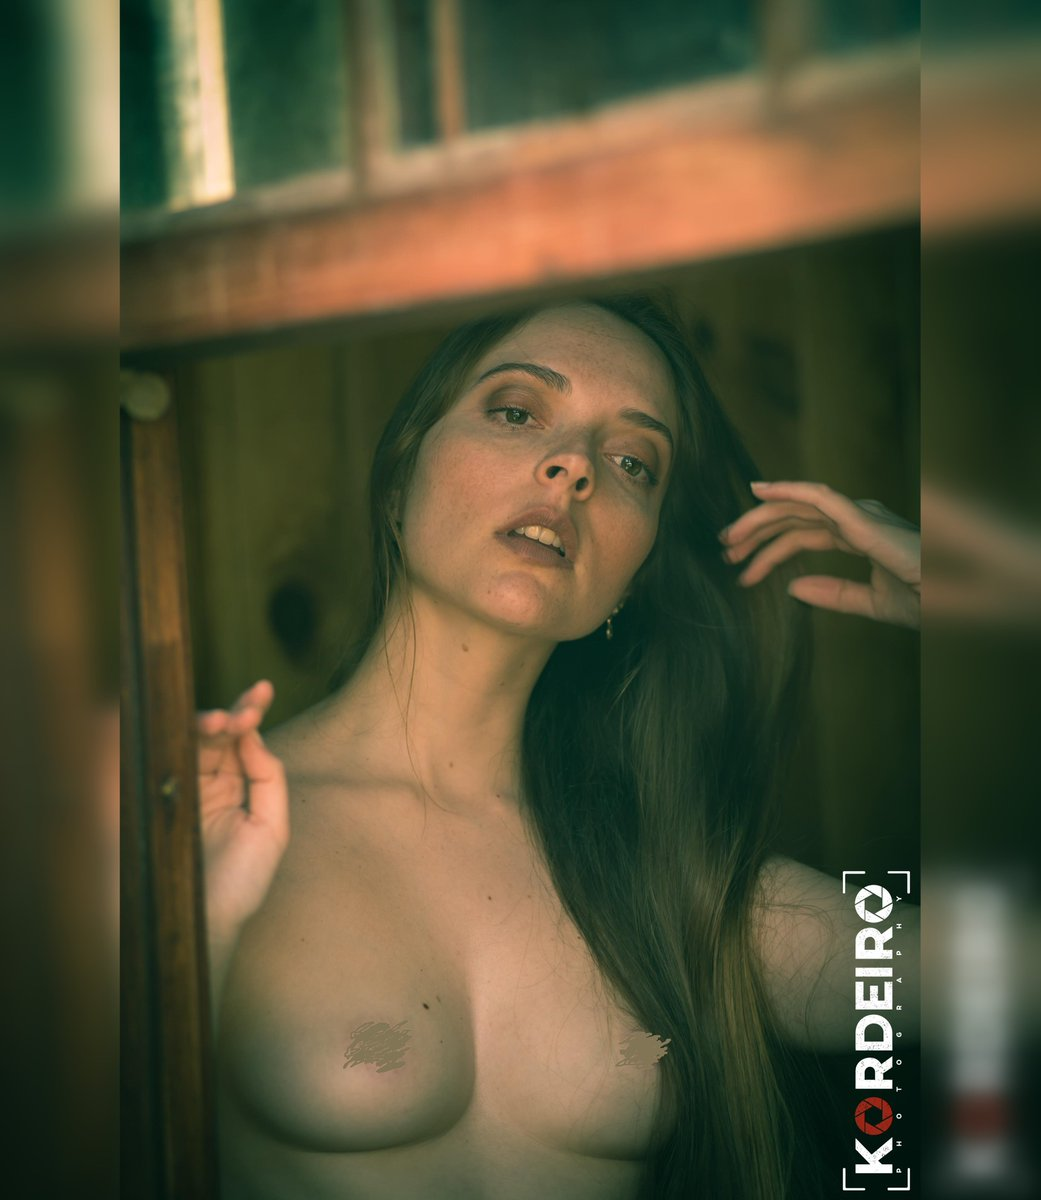 #Model: #DianaRosa #Photography: #JorgeCordeiro Production: #AnaLuar MUA: #BeatrizVaz  #photoshoot #modeling #fineart #beauty #beautiful #romantic #renaissance #preraphaelite #mysterious #intimist #autumn #bythewindow #portrait #naturalbeauty #classicbeauty #simple #woodcabin https://t.co/MAetItzVo5